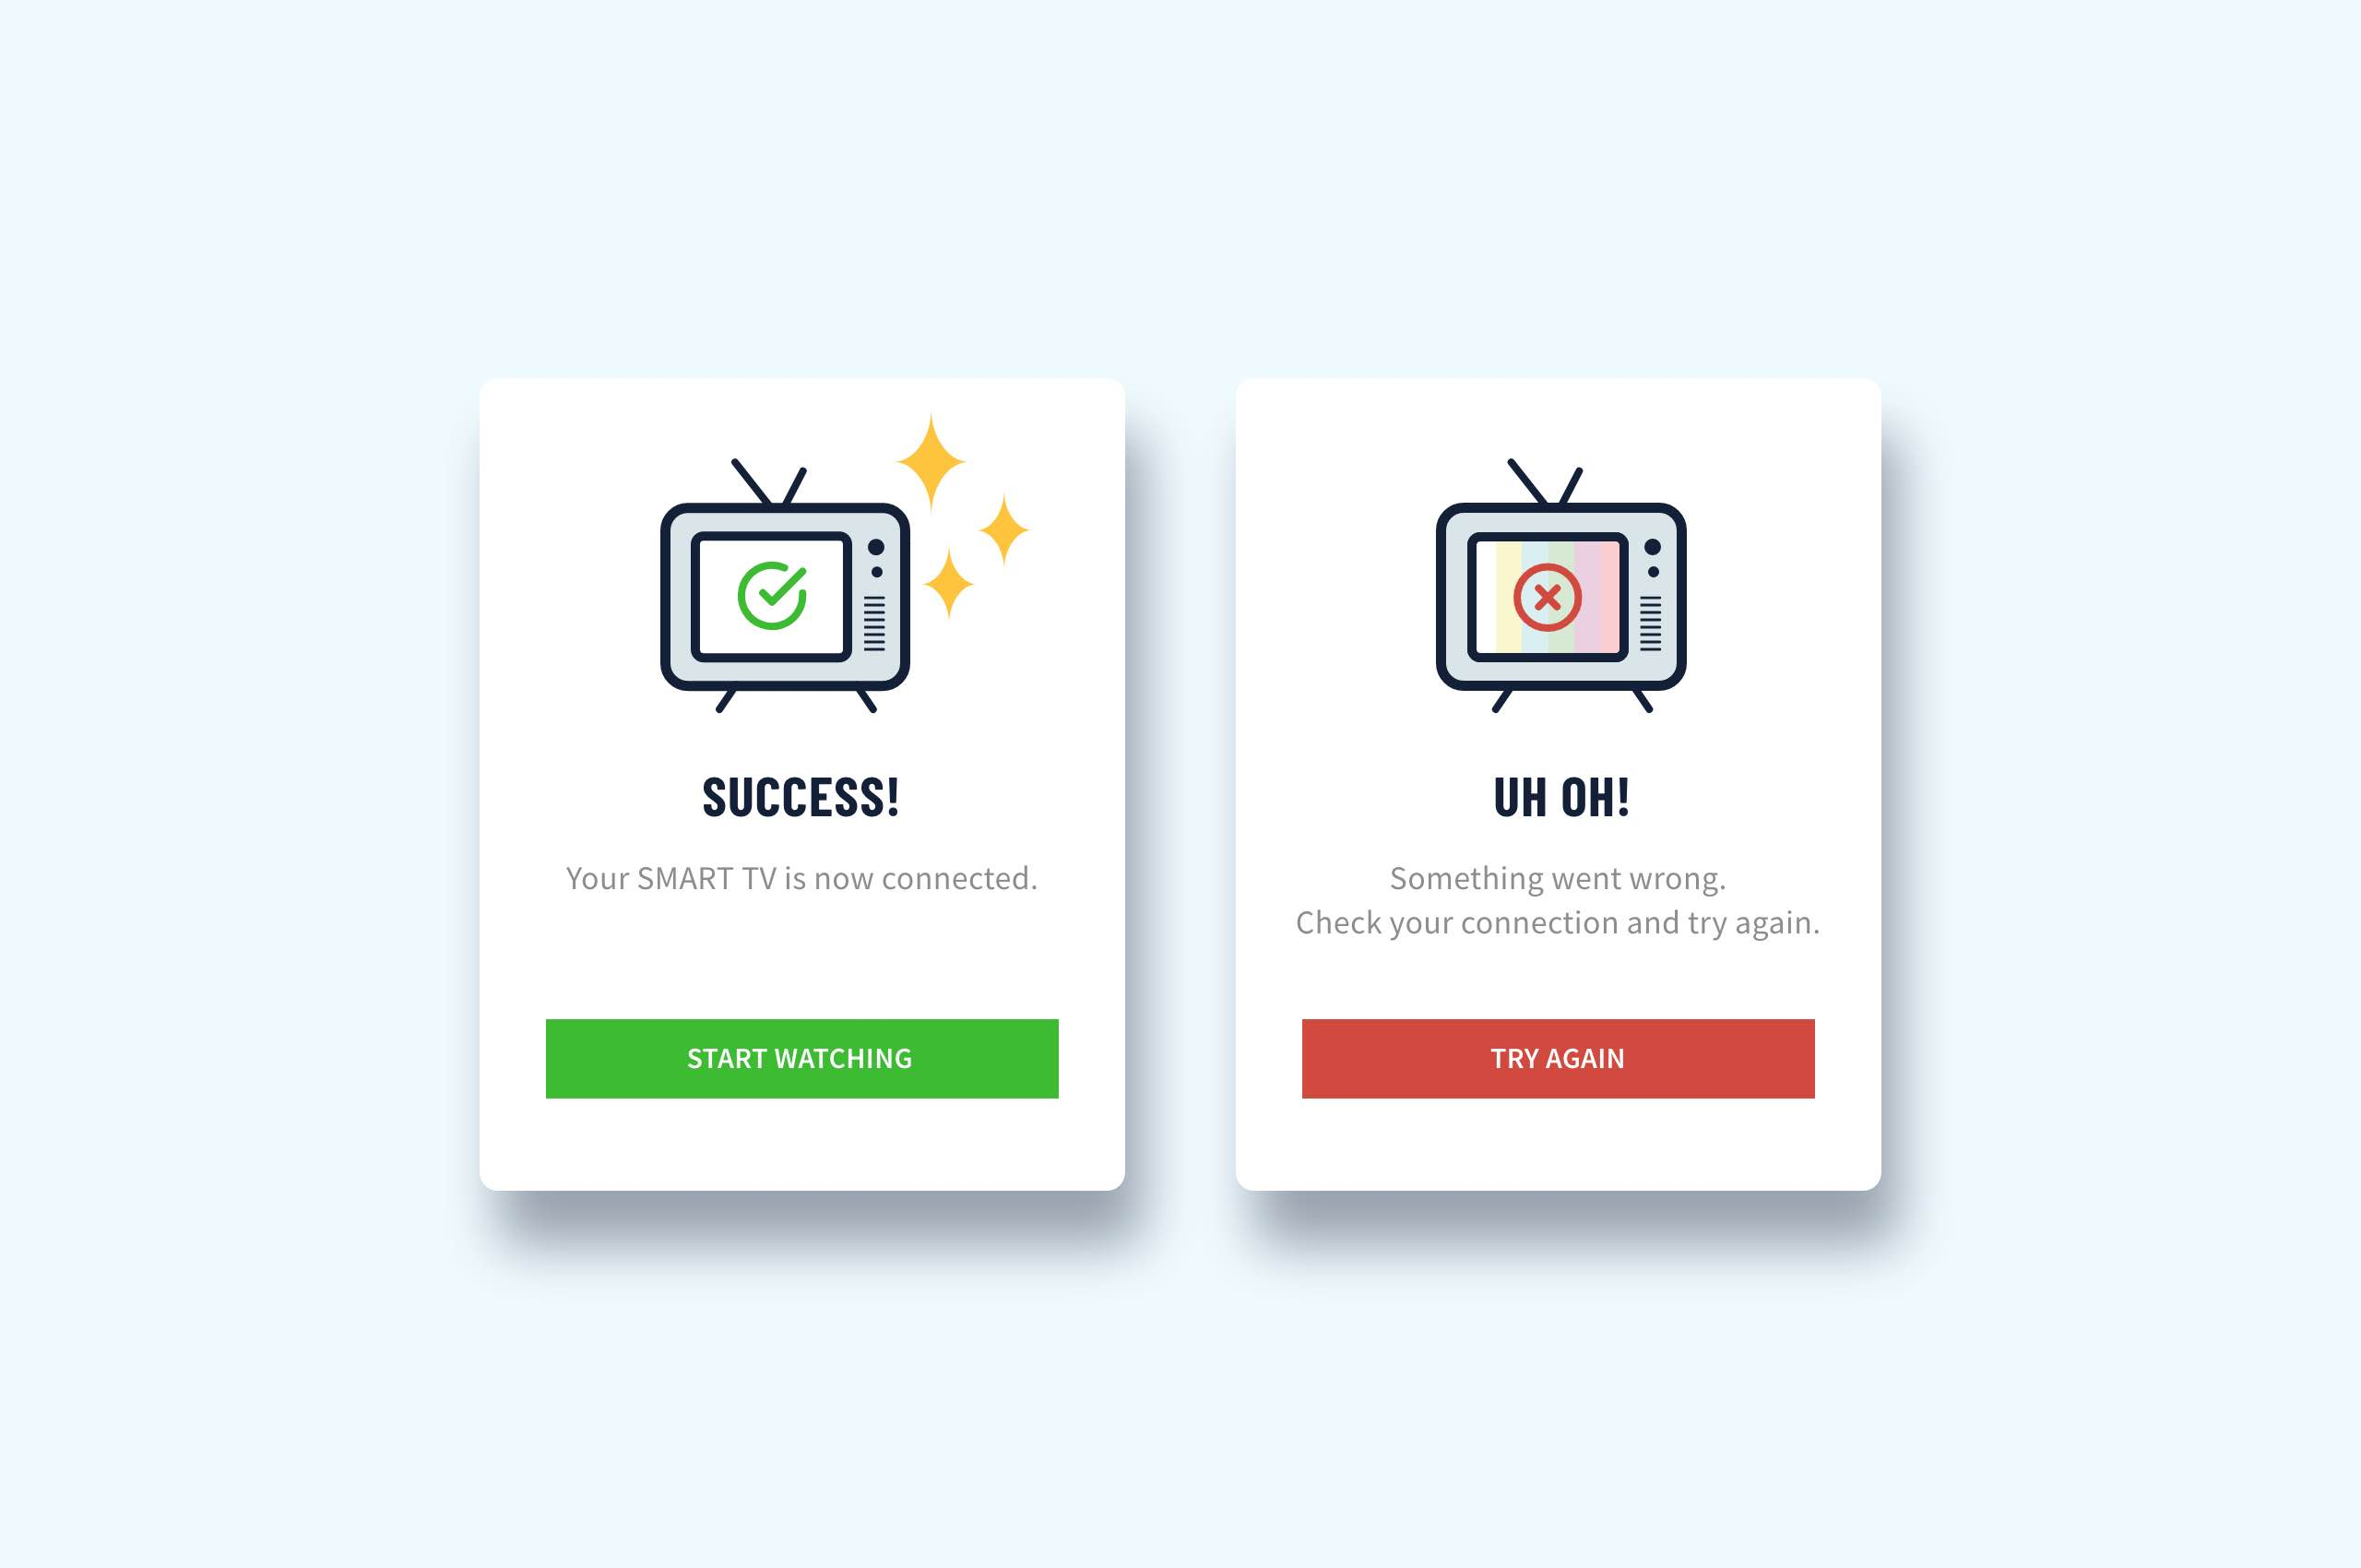 Daily UI 11 - Flash Message, Smart TV App